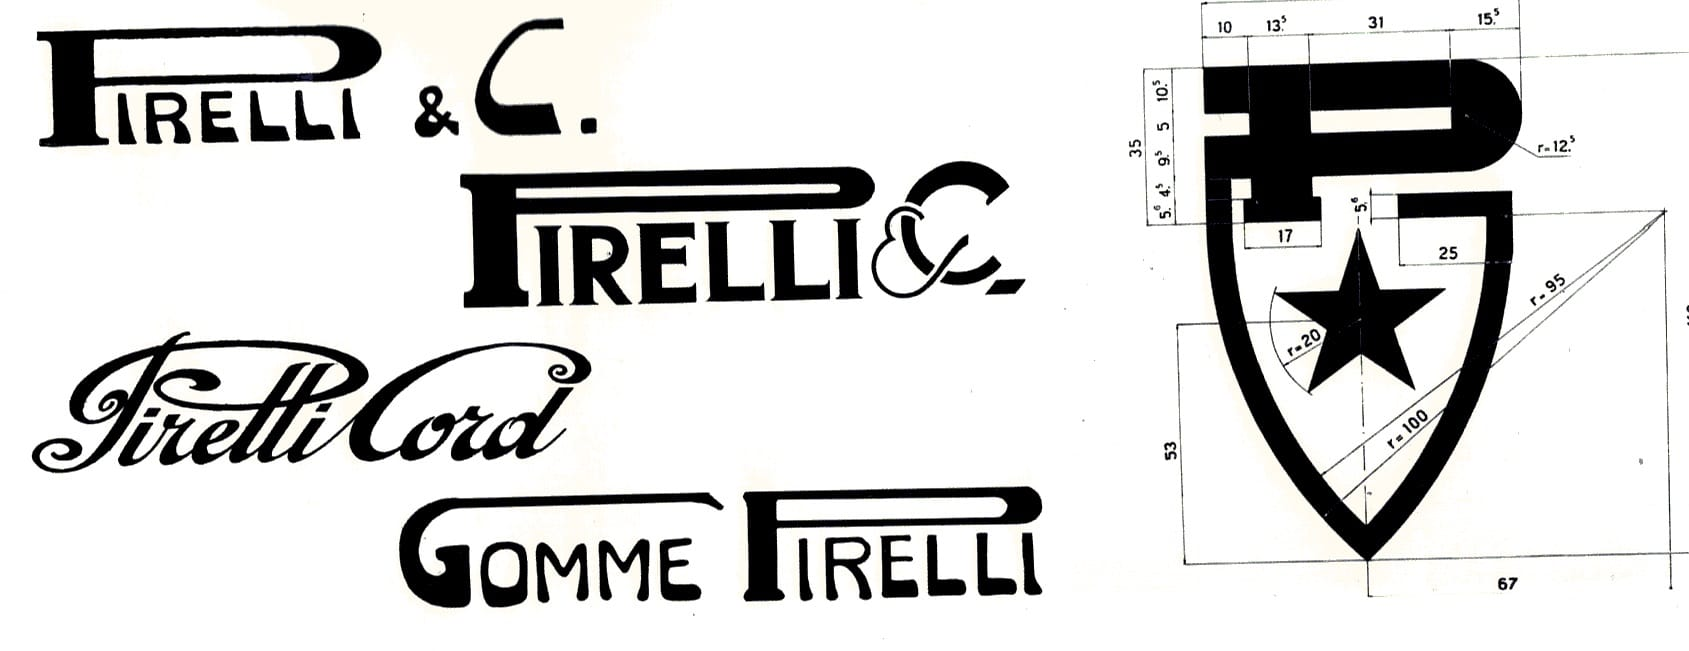 logo producator de anvelope pirelli